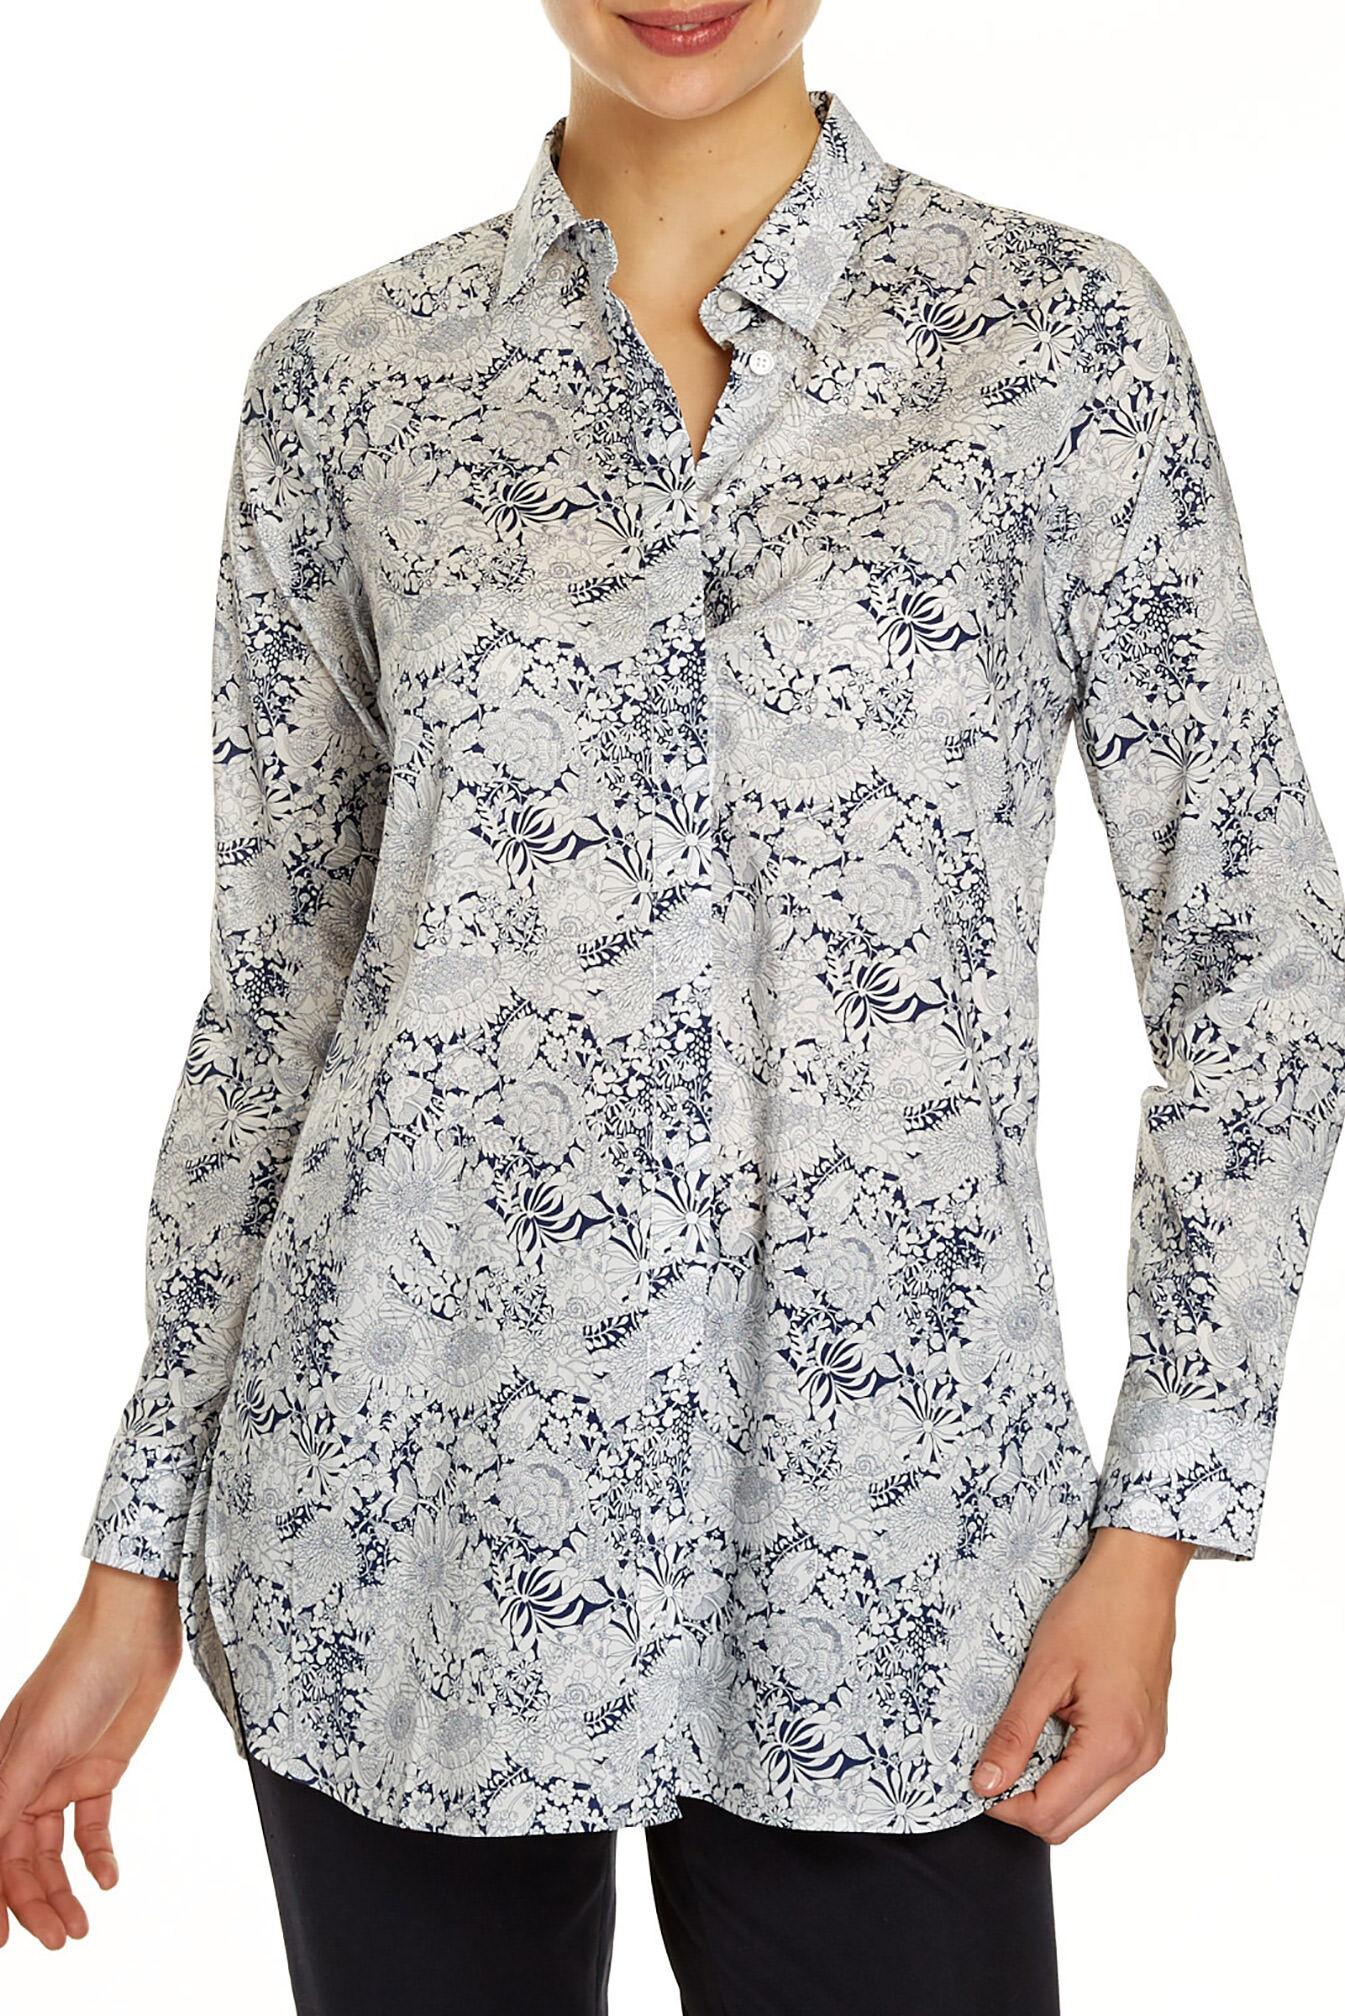 new sportscraft womens ursula liberty shirt tops blouses ebay. Black Bedroom Furniture Sets. Home Design Ideas